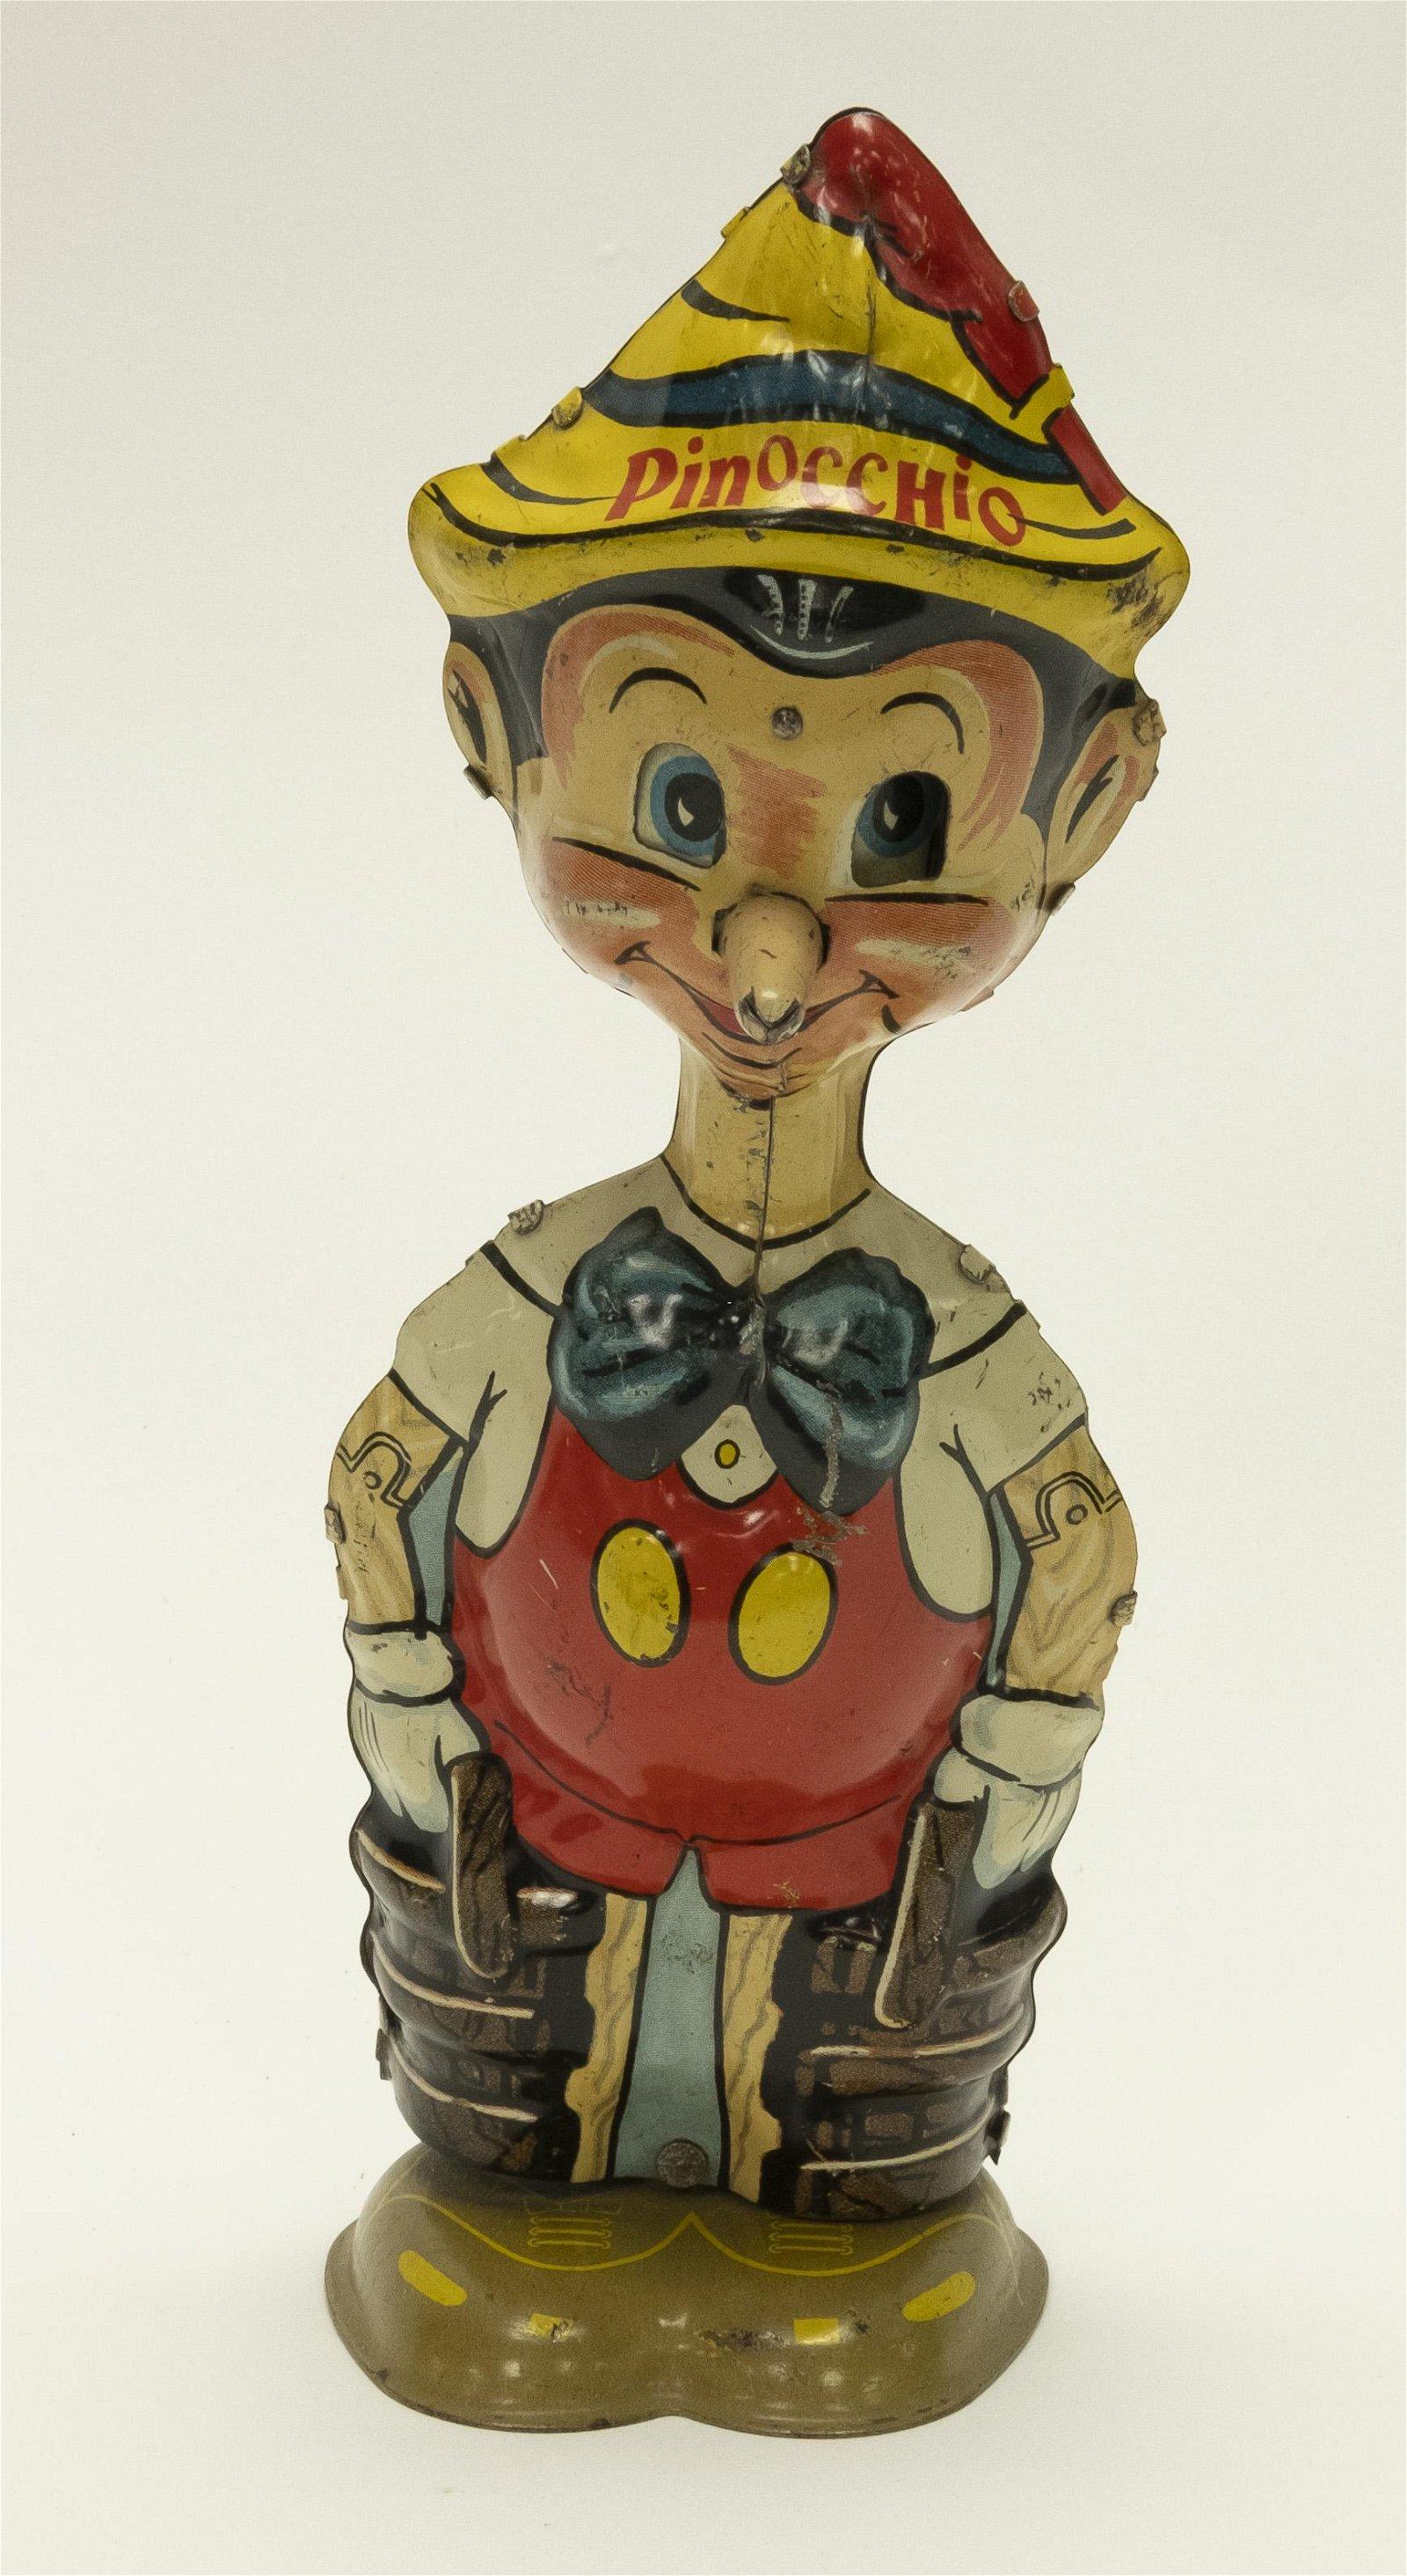 Marx Pinocchio Tin Windup Toy